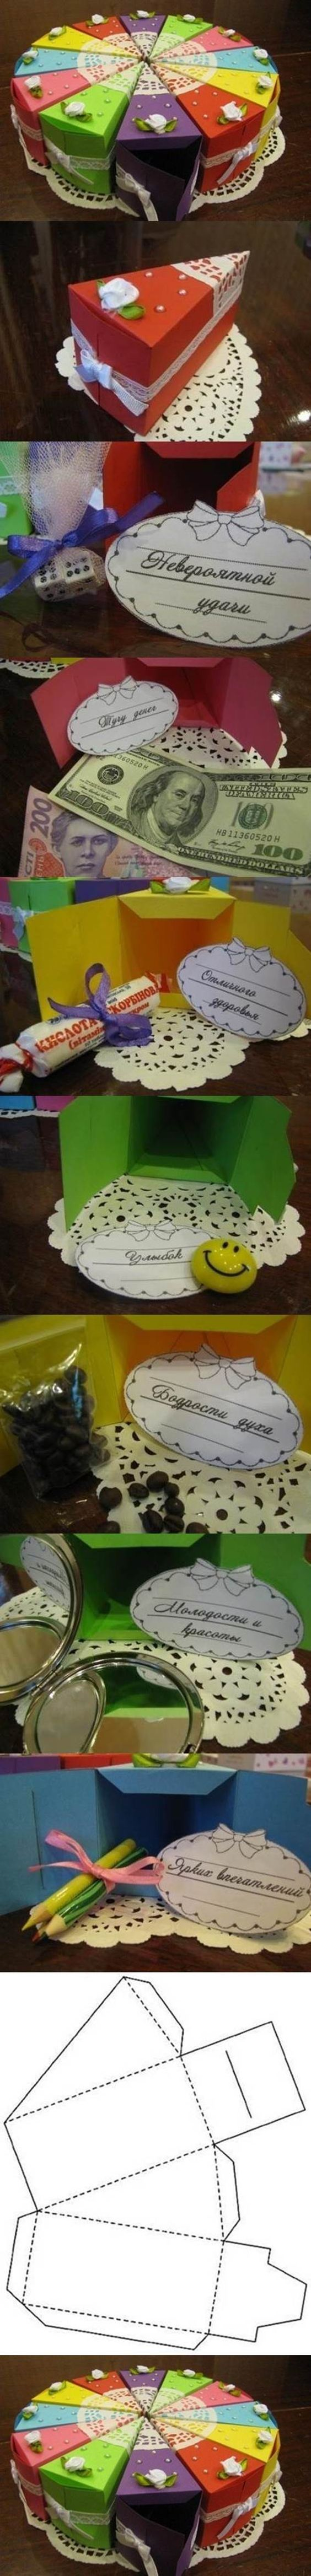 DIY Cake Shaped Gift Boxes | iCreativeIdeas.com Like Us on Facebook ==> https://www.facebook.com/icreativeideas: